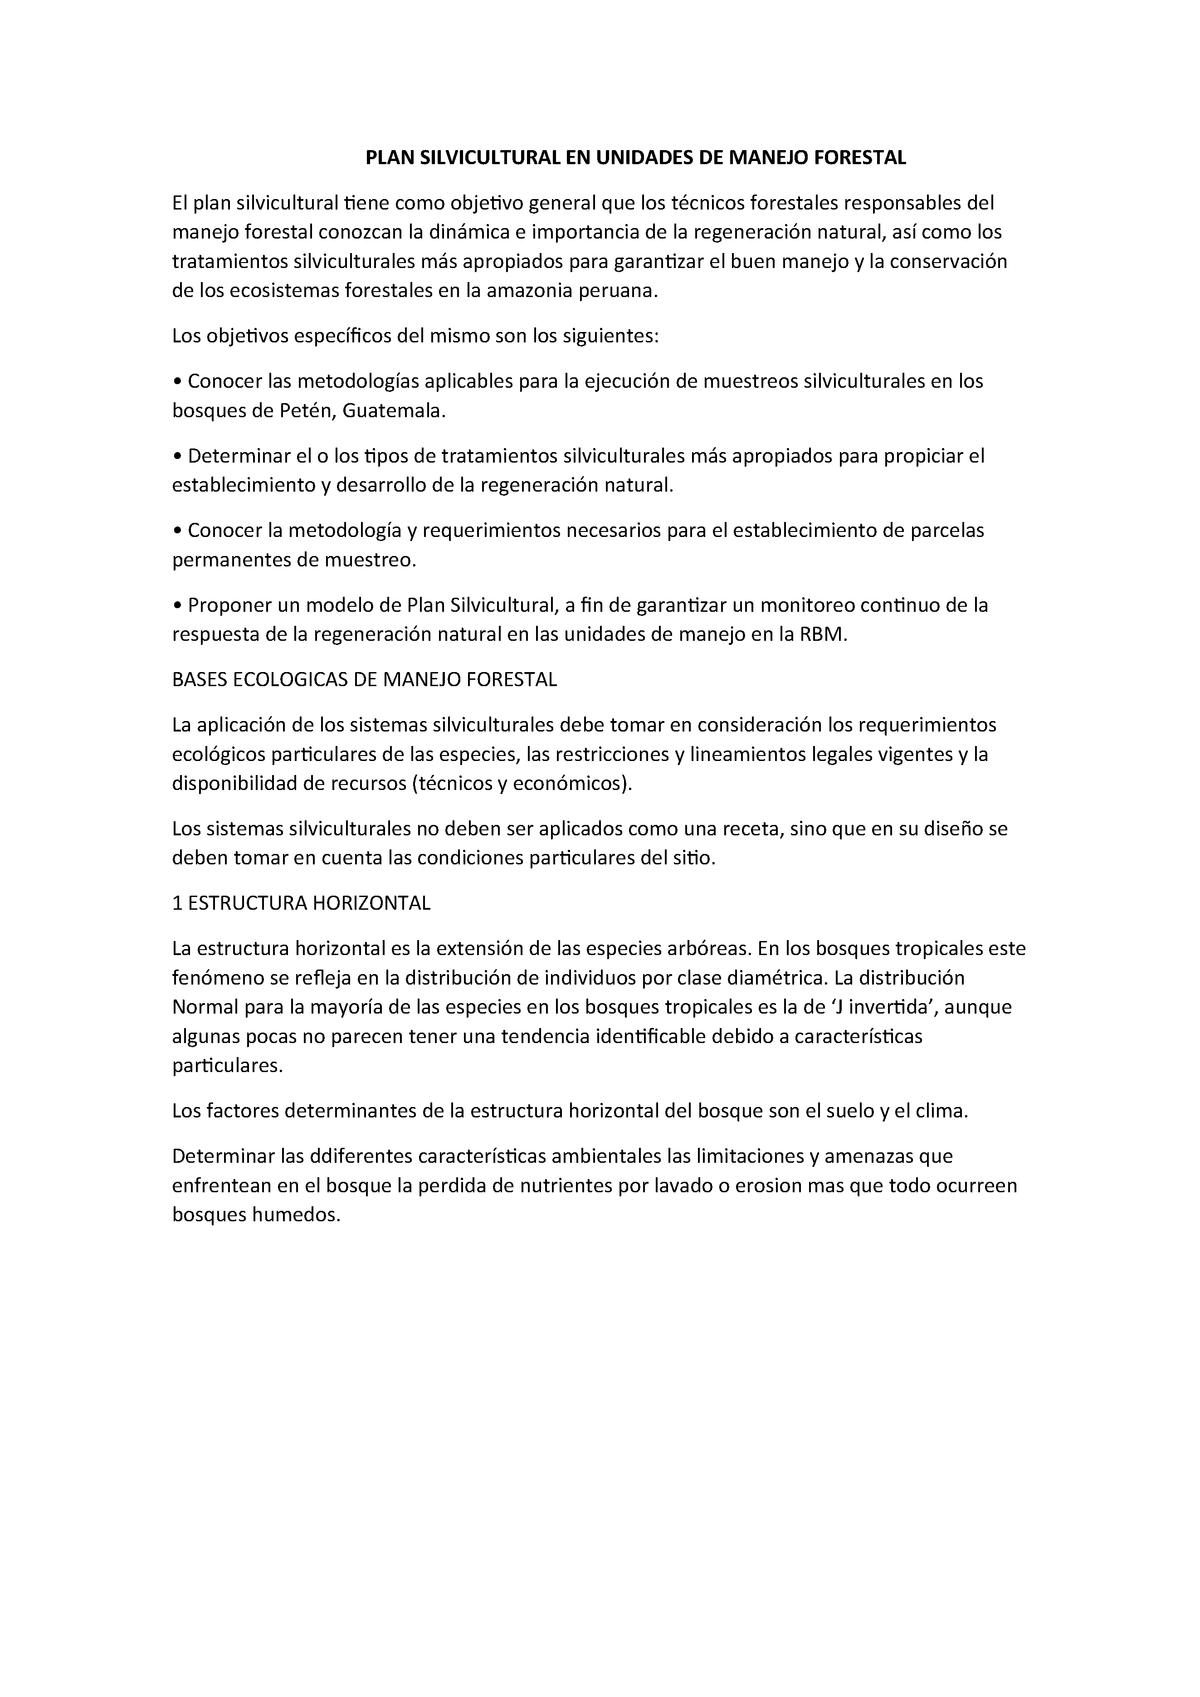 Plan Silvicultural En Unidades De Manejo Forestal Ma1016